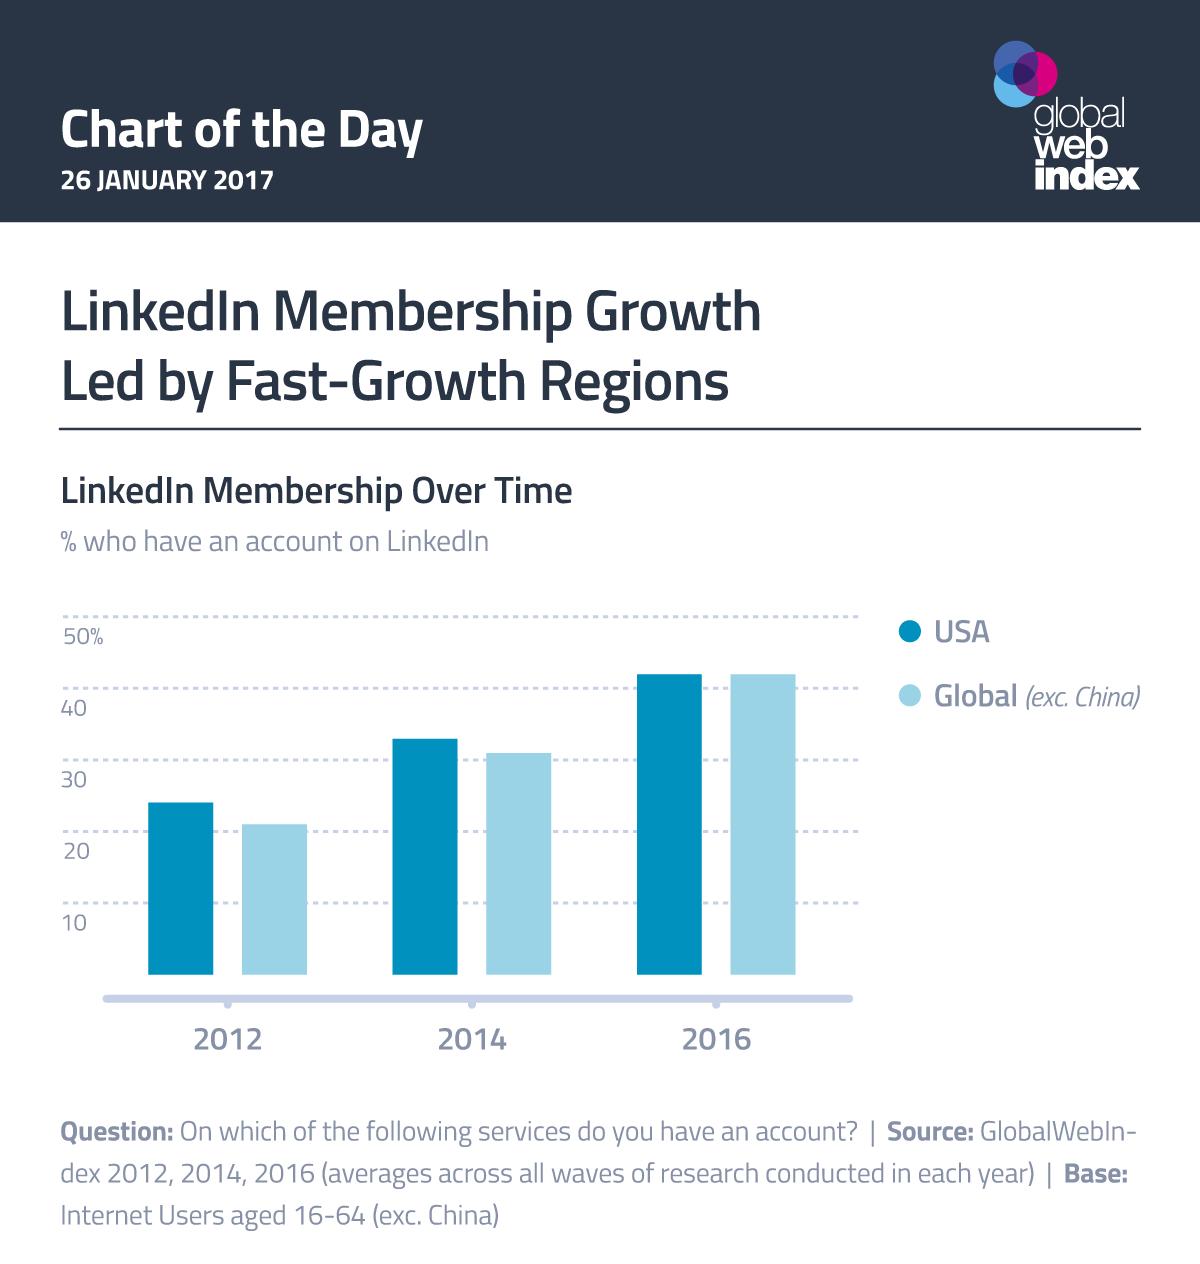 LinkedIn Membership Growth Led by Fast-Growth Regions